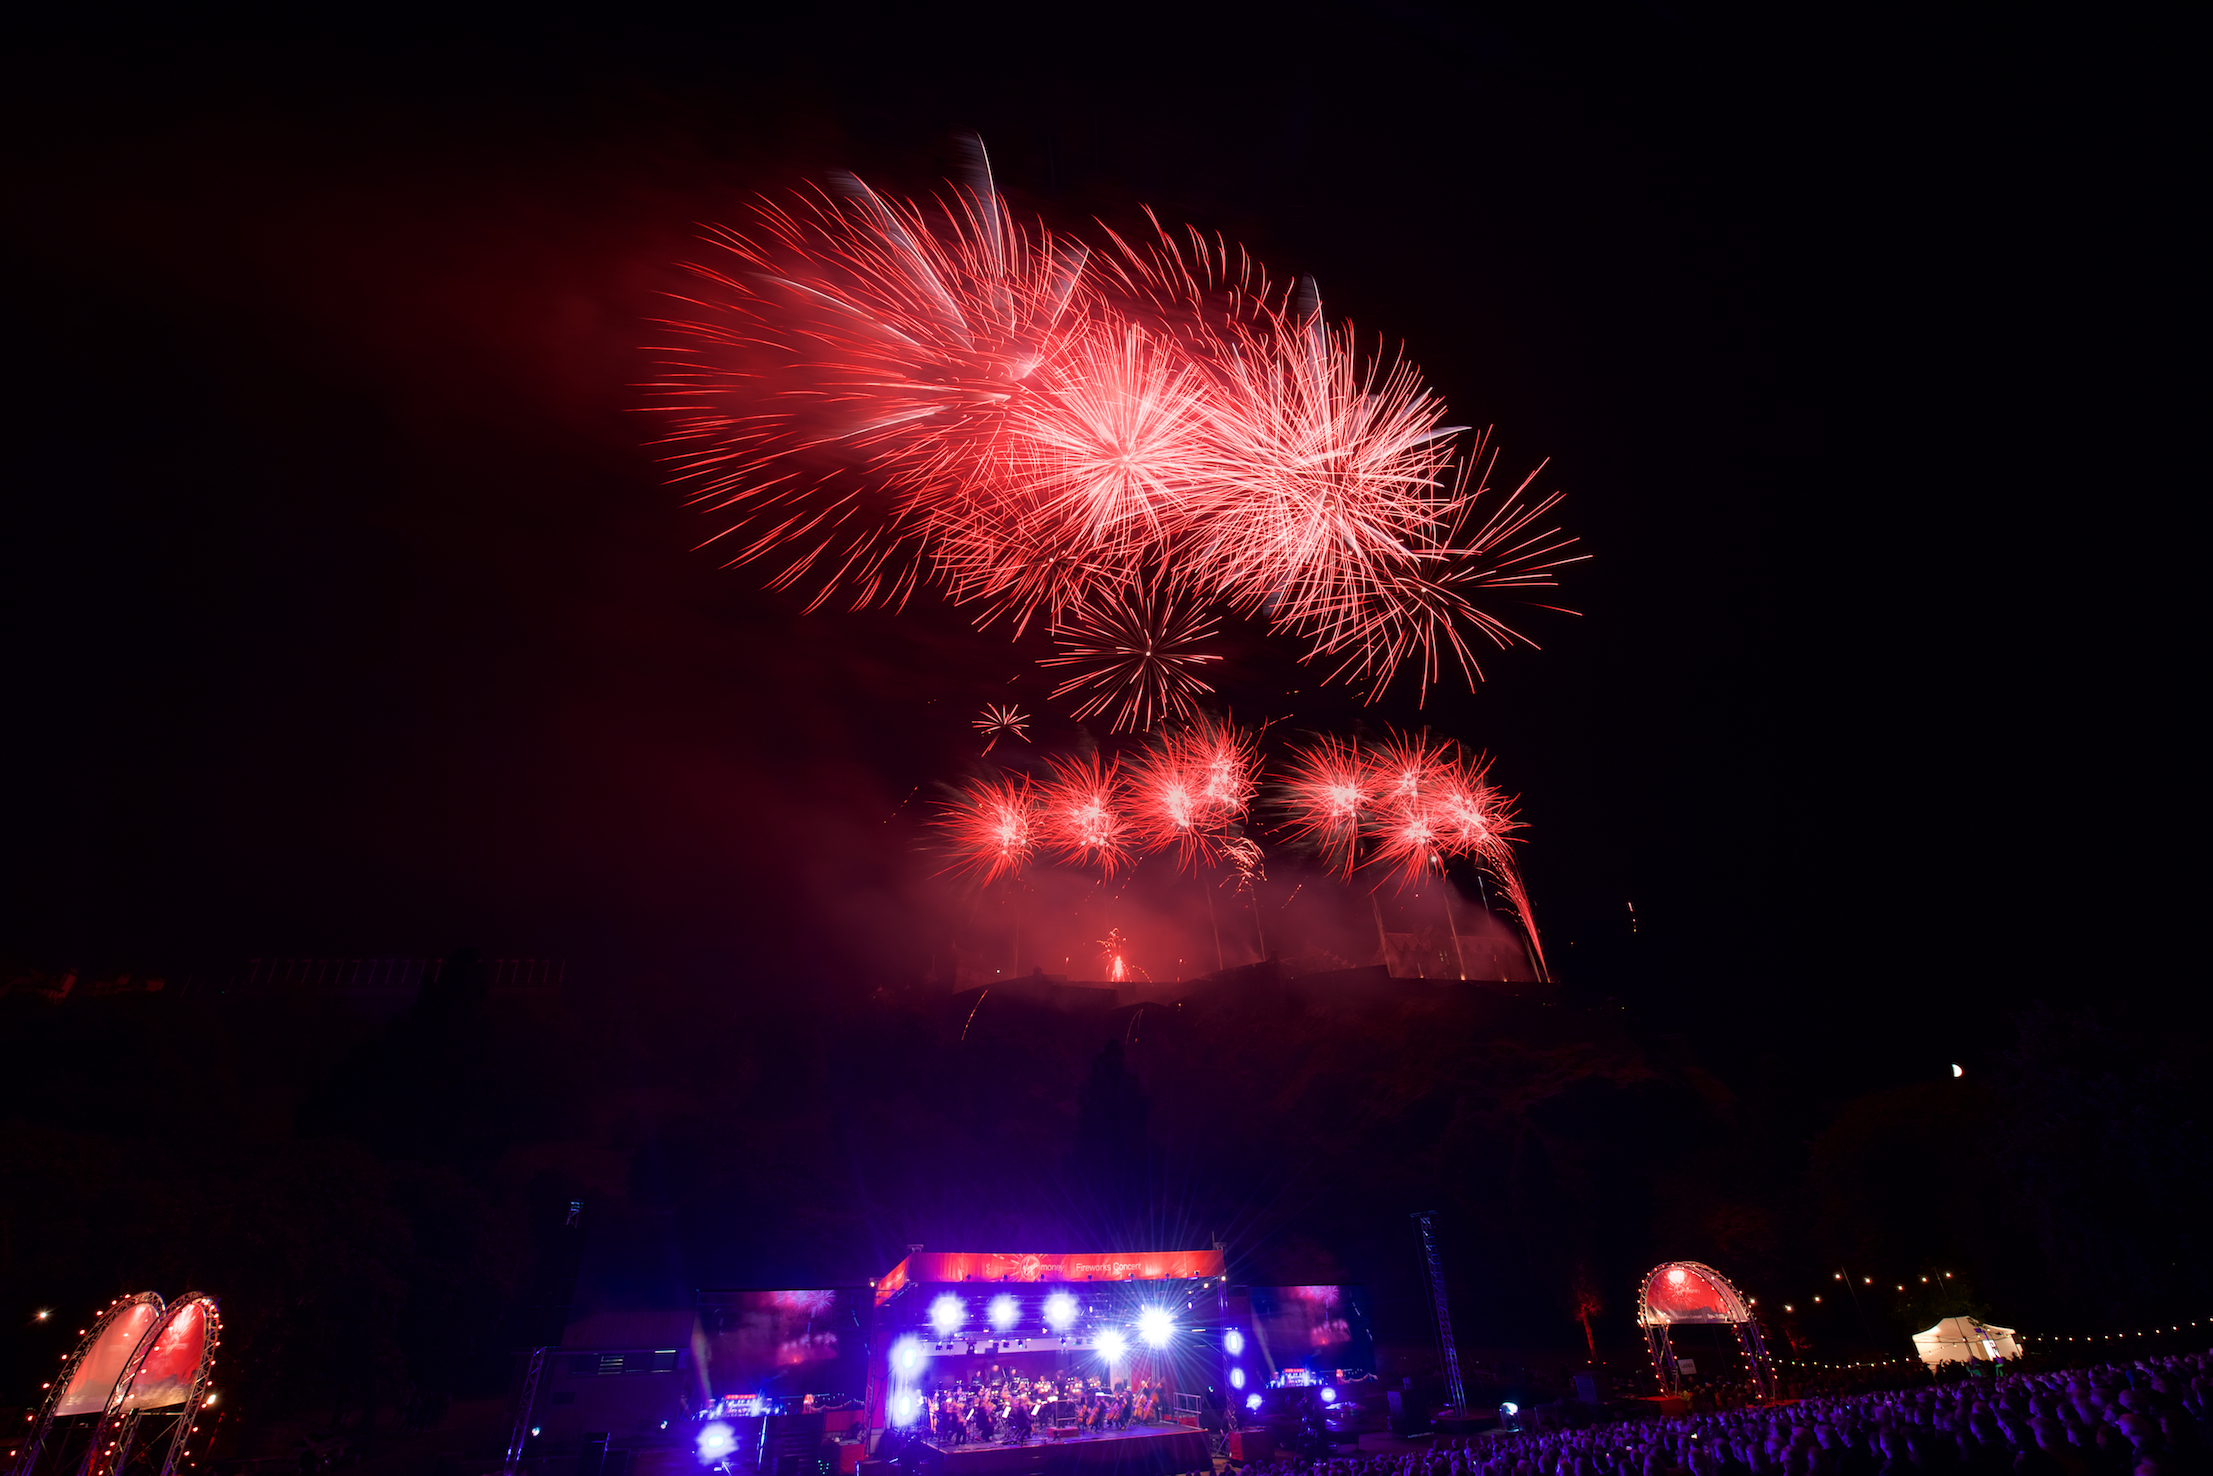 grand-finale-of-the-2017-international-festival-virgin-money-fireworks-concert-ross-bandstand-princes-street-gardens-edinburgh-uk-monday-28th-august-2017-5